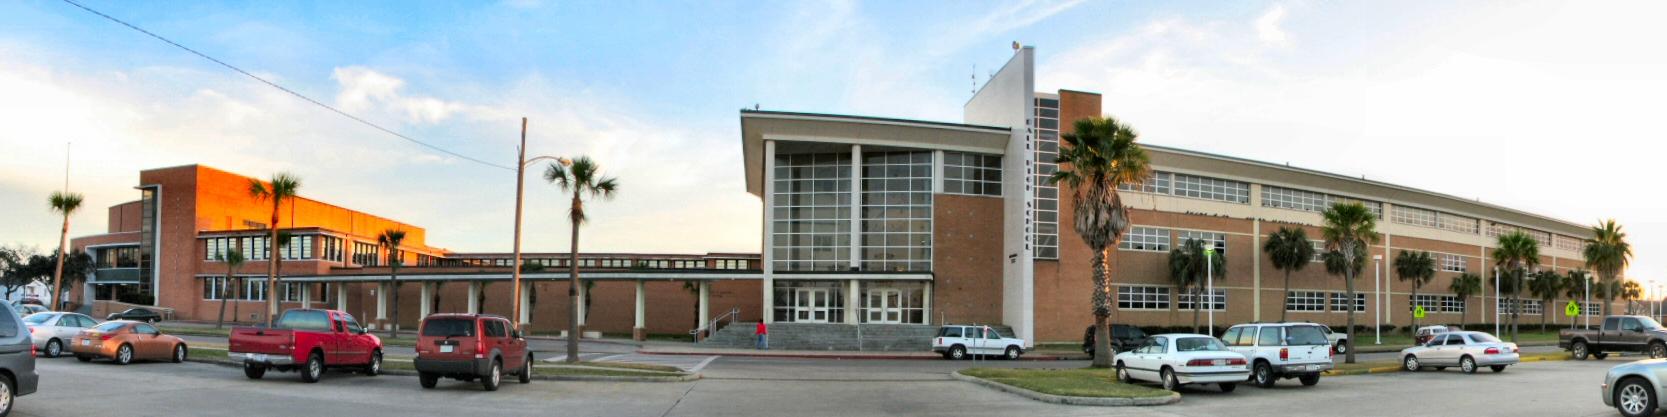 File:Galveston Ball High 2007.jpg